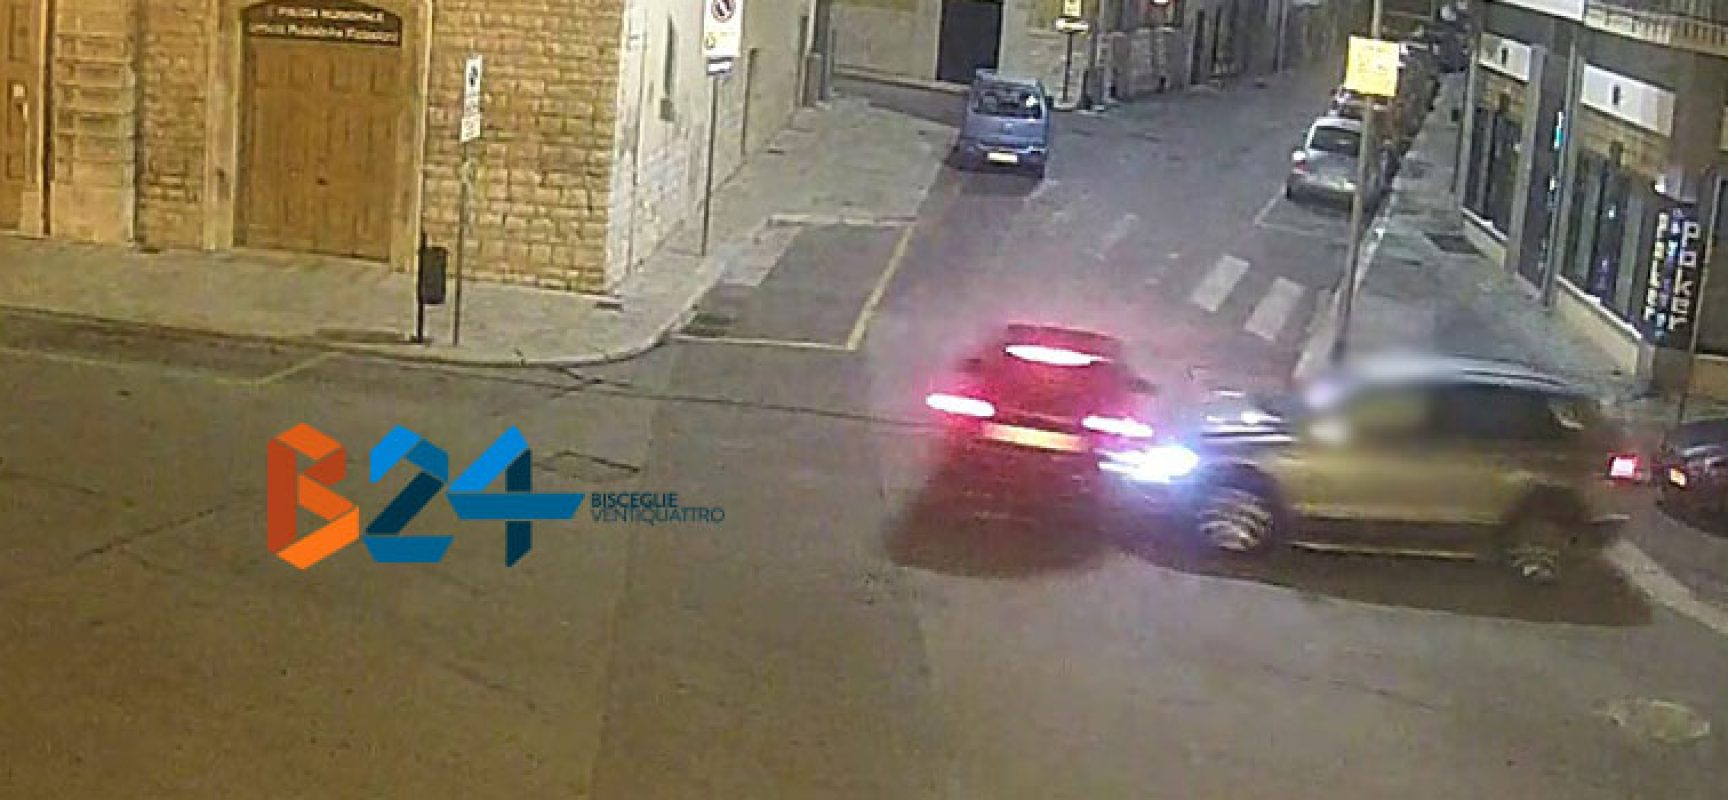 Violento scontro tra due auto in piazza San Francesco, 51enne al pronto soccorso